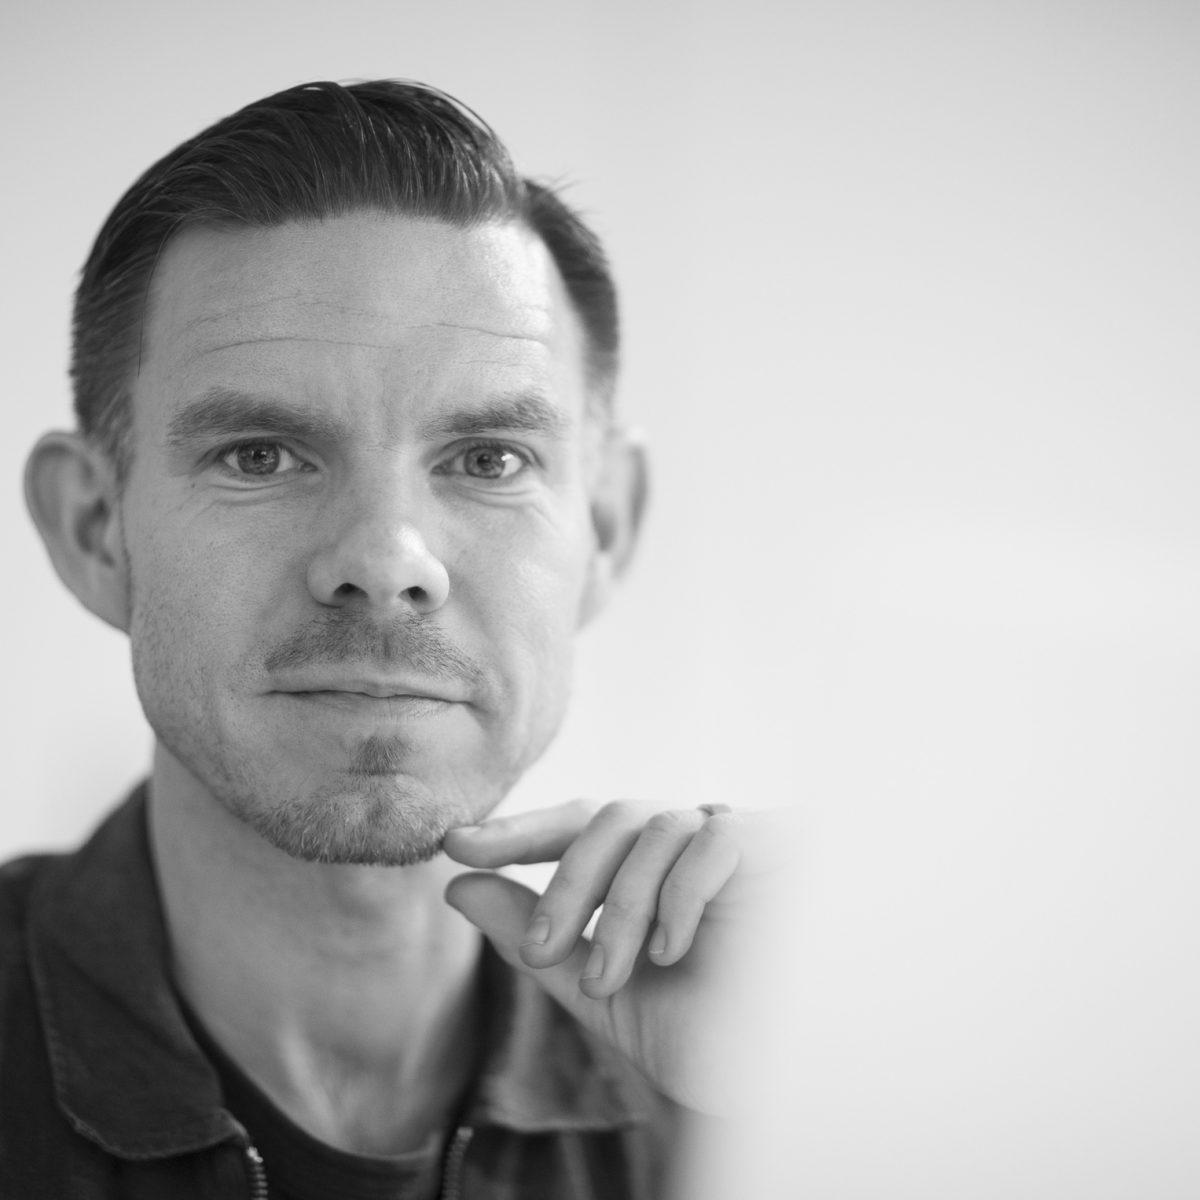 Kristian Luoma